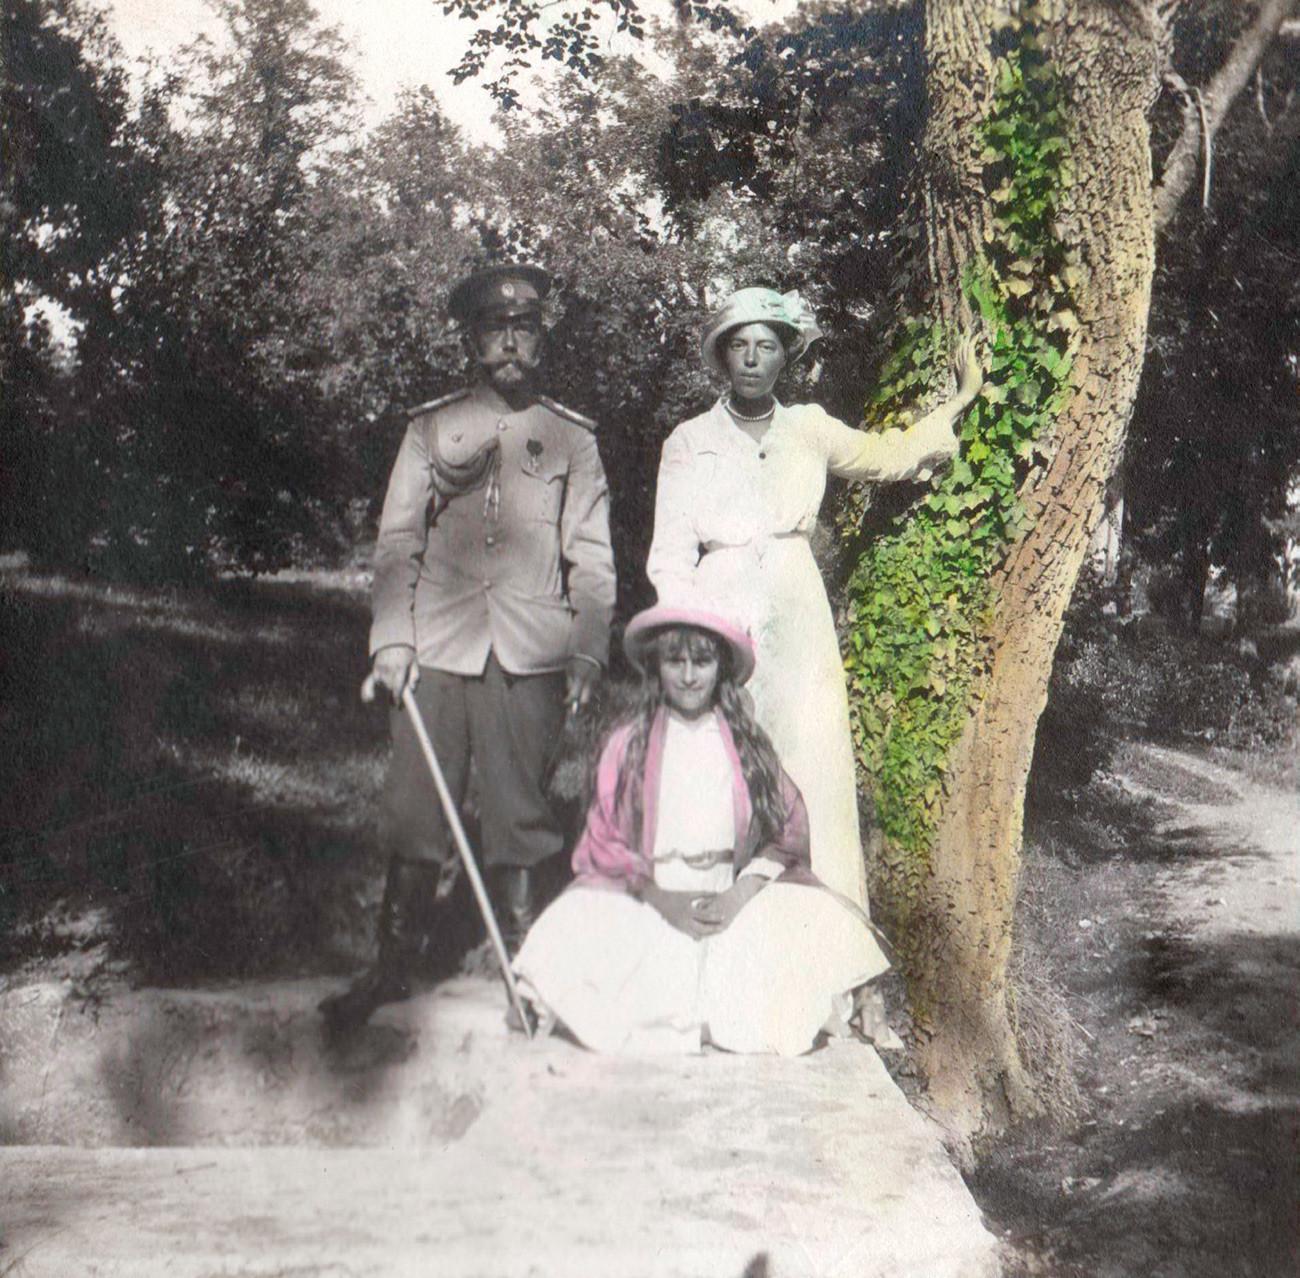 Nicolas II, sa fille Anastasia et sa sœur Olga. La photographie a été coloriée par Anastasia.